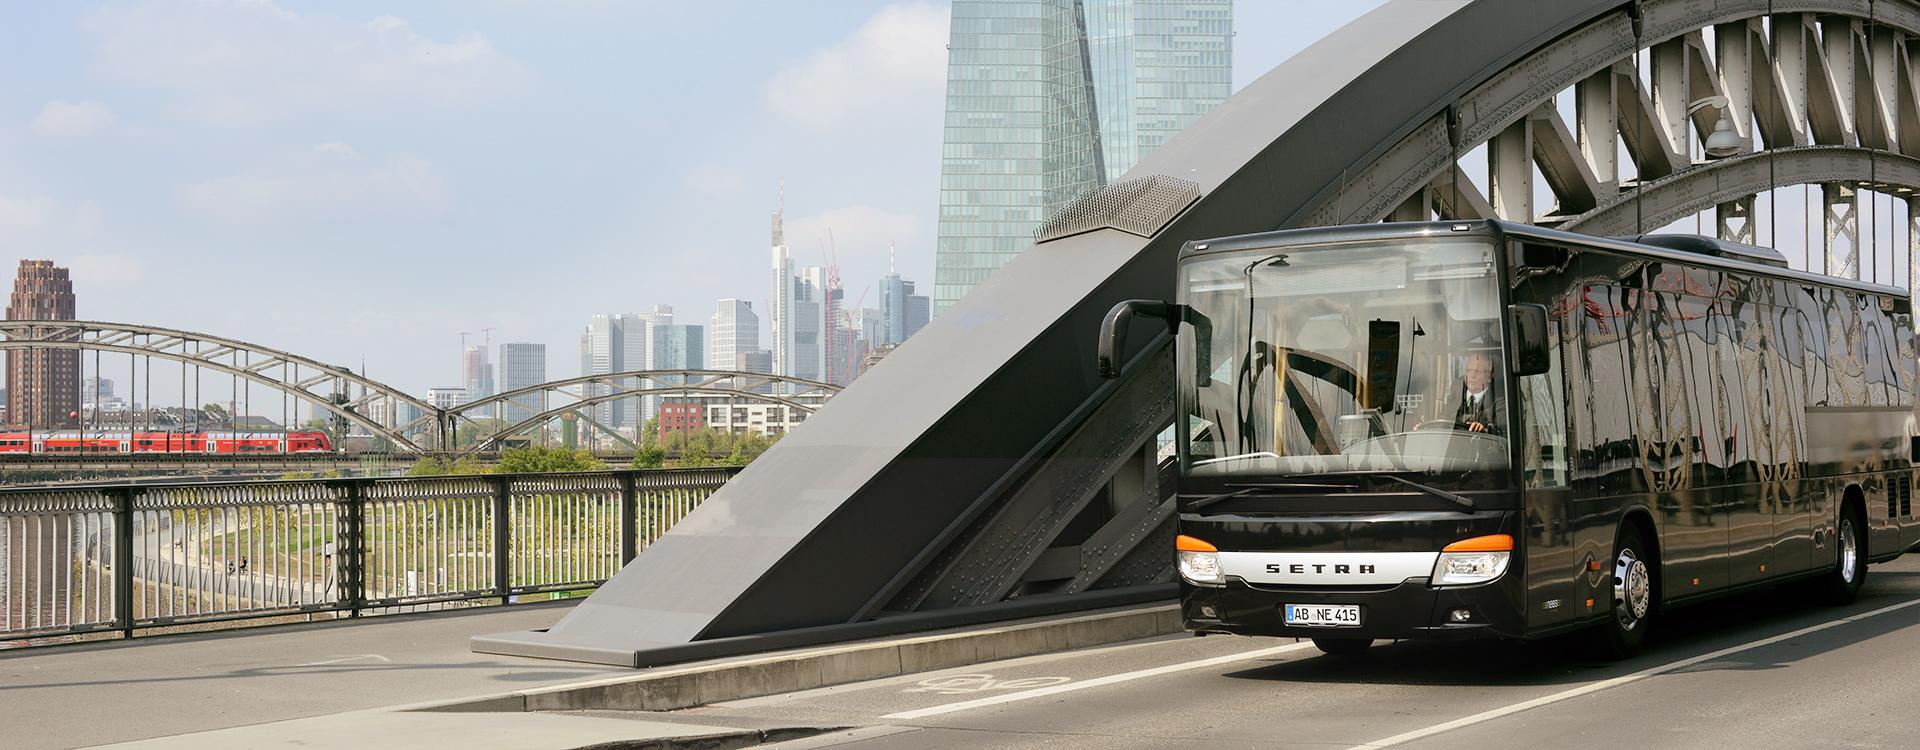 setra 415 le shuttlebus mieten frankfurt mainz wiesbaden. Black Bedroom Furniture Sets. Home Design Ideas